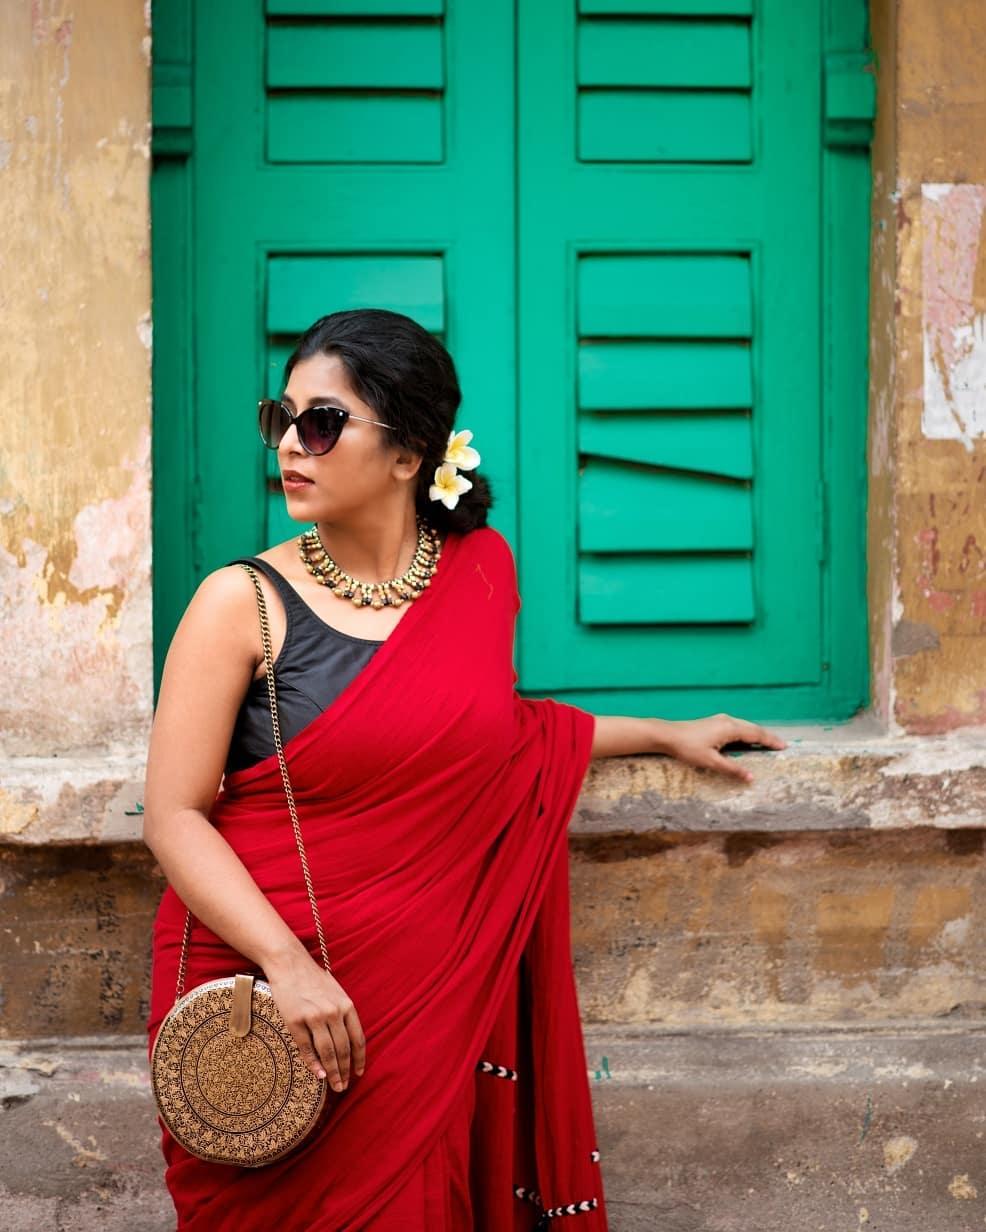 sun-glasses-and-sarees (1)